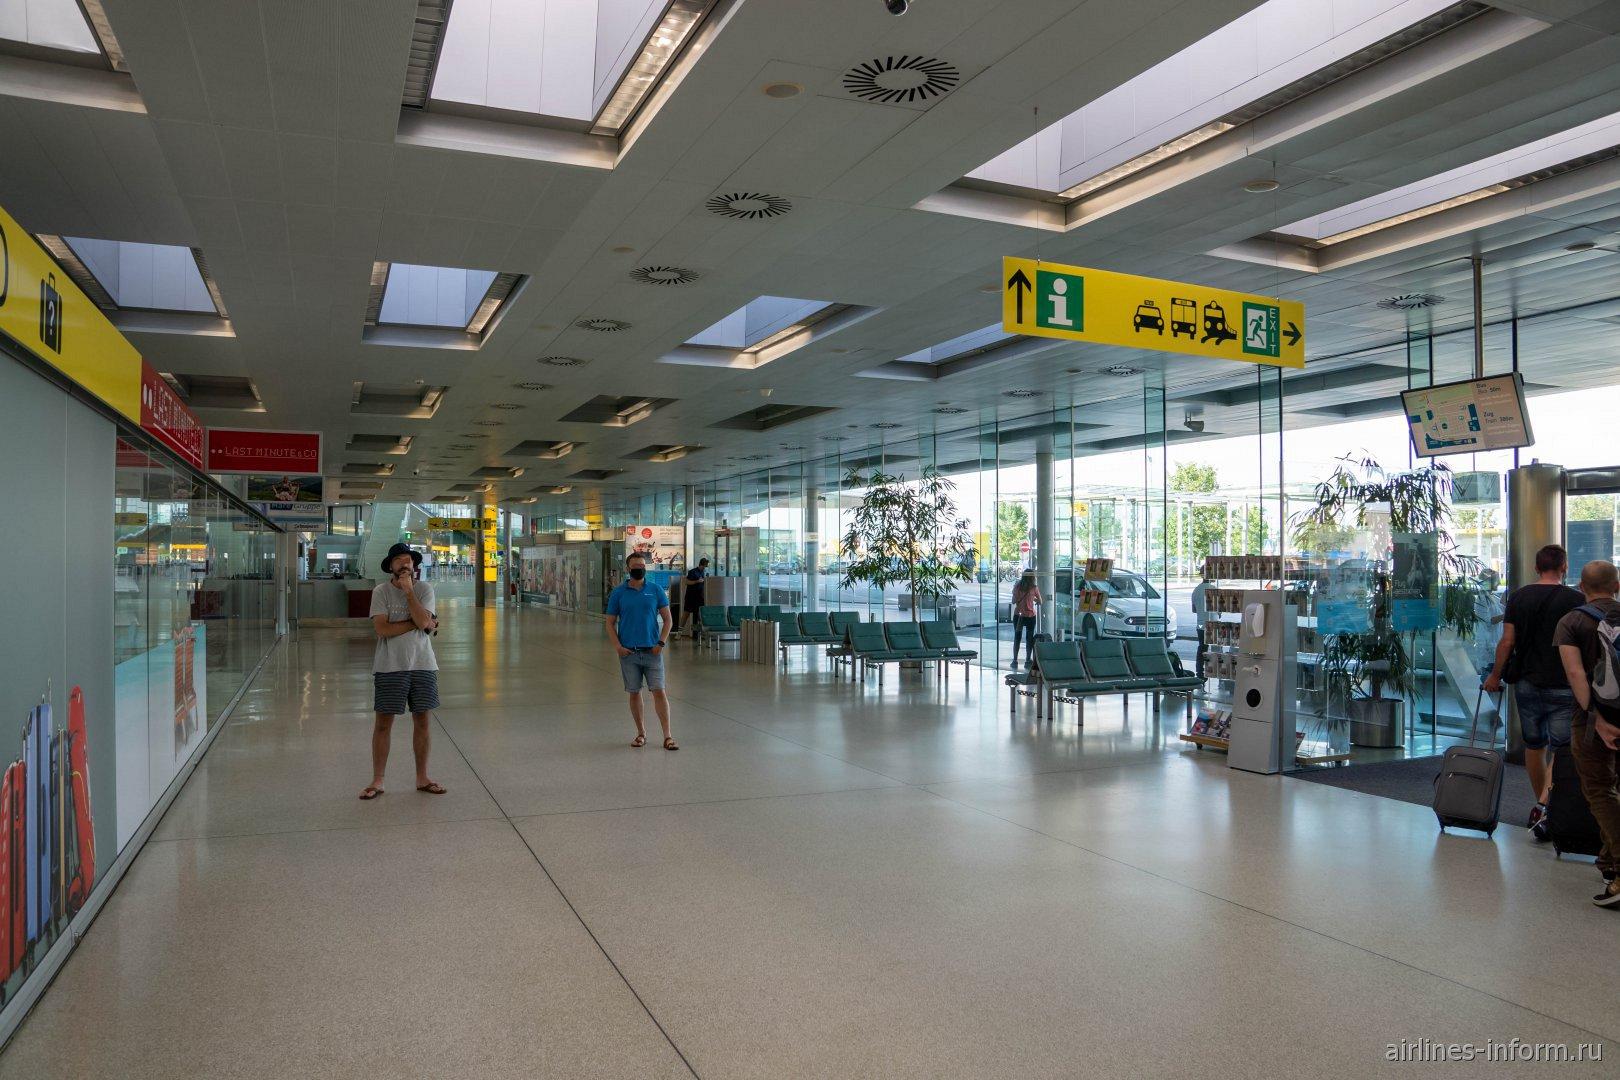 Зона прилета в аэропорту Грац Талерхоф